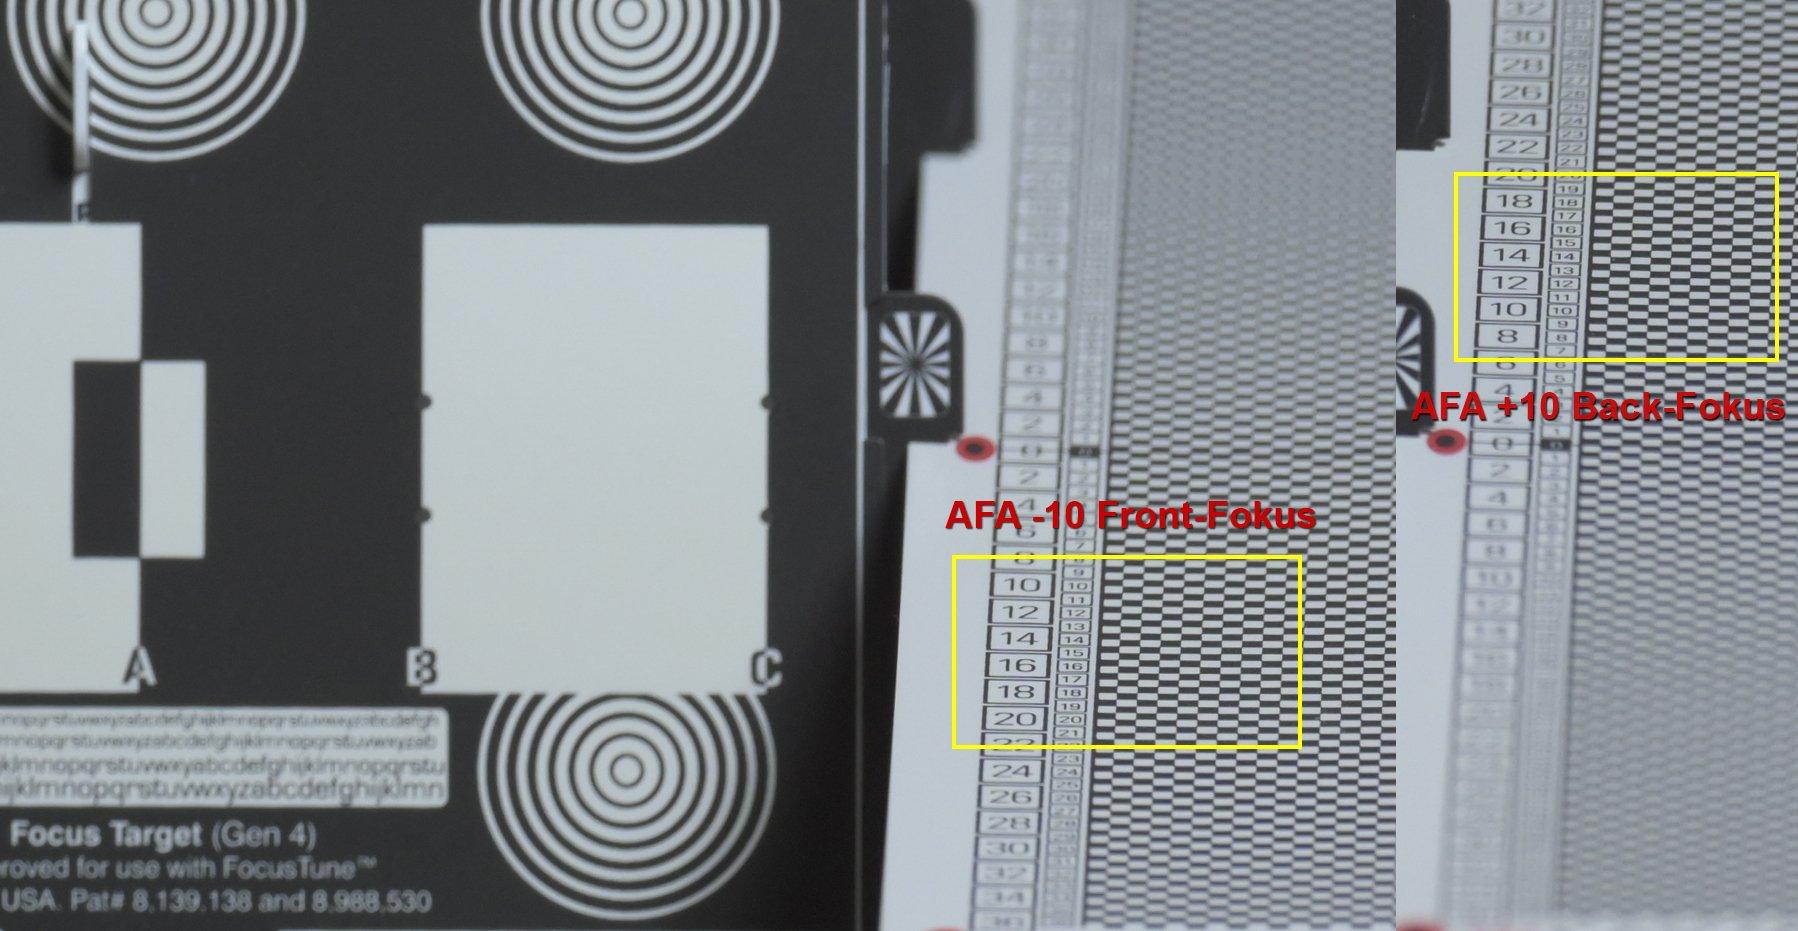 Z7 mit AF-S NIKKOR 500mm 1:5,6E PF ED VR - 2 JPEG AFA -10 und AFA +10